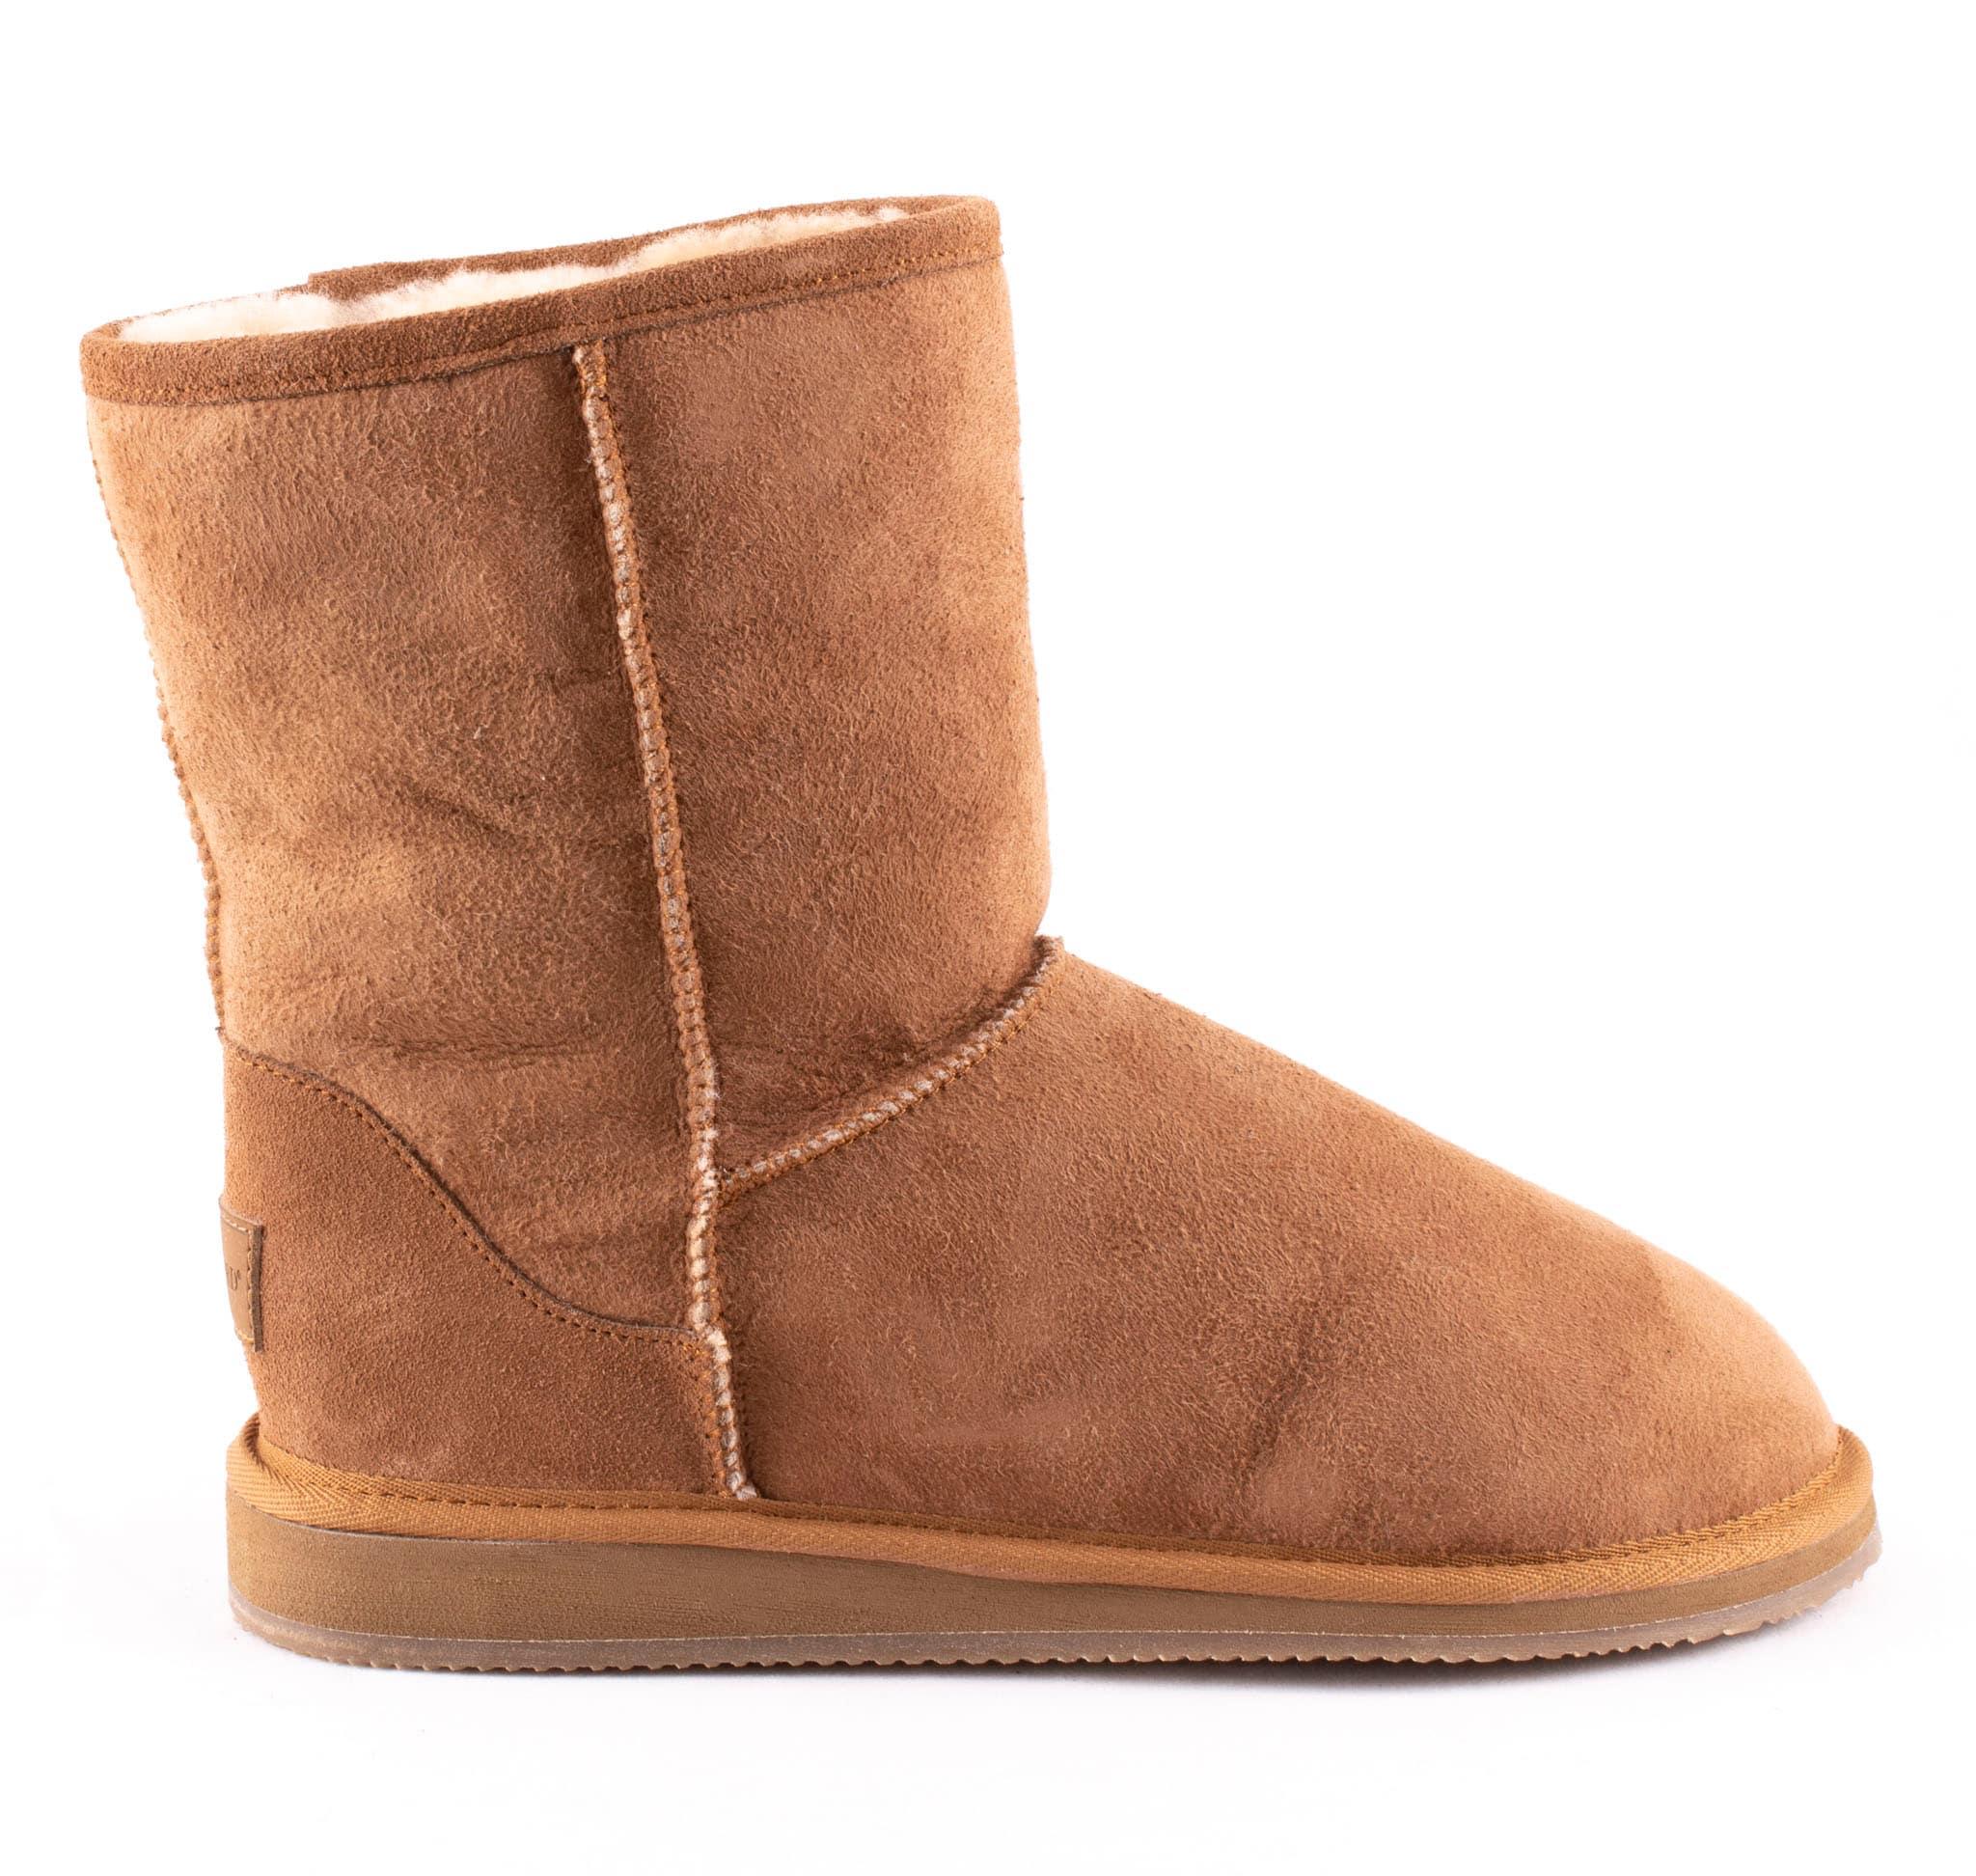 Linda, soft sheepskin boots Camel